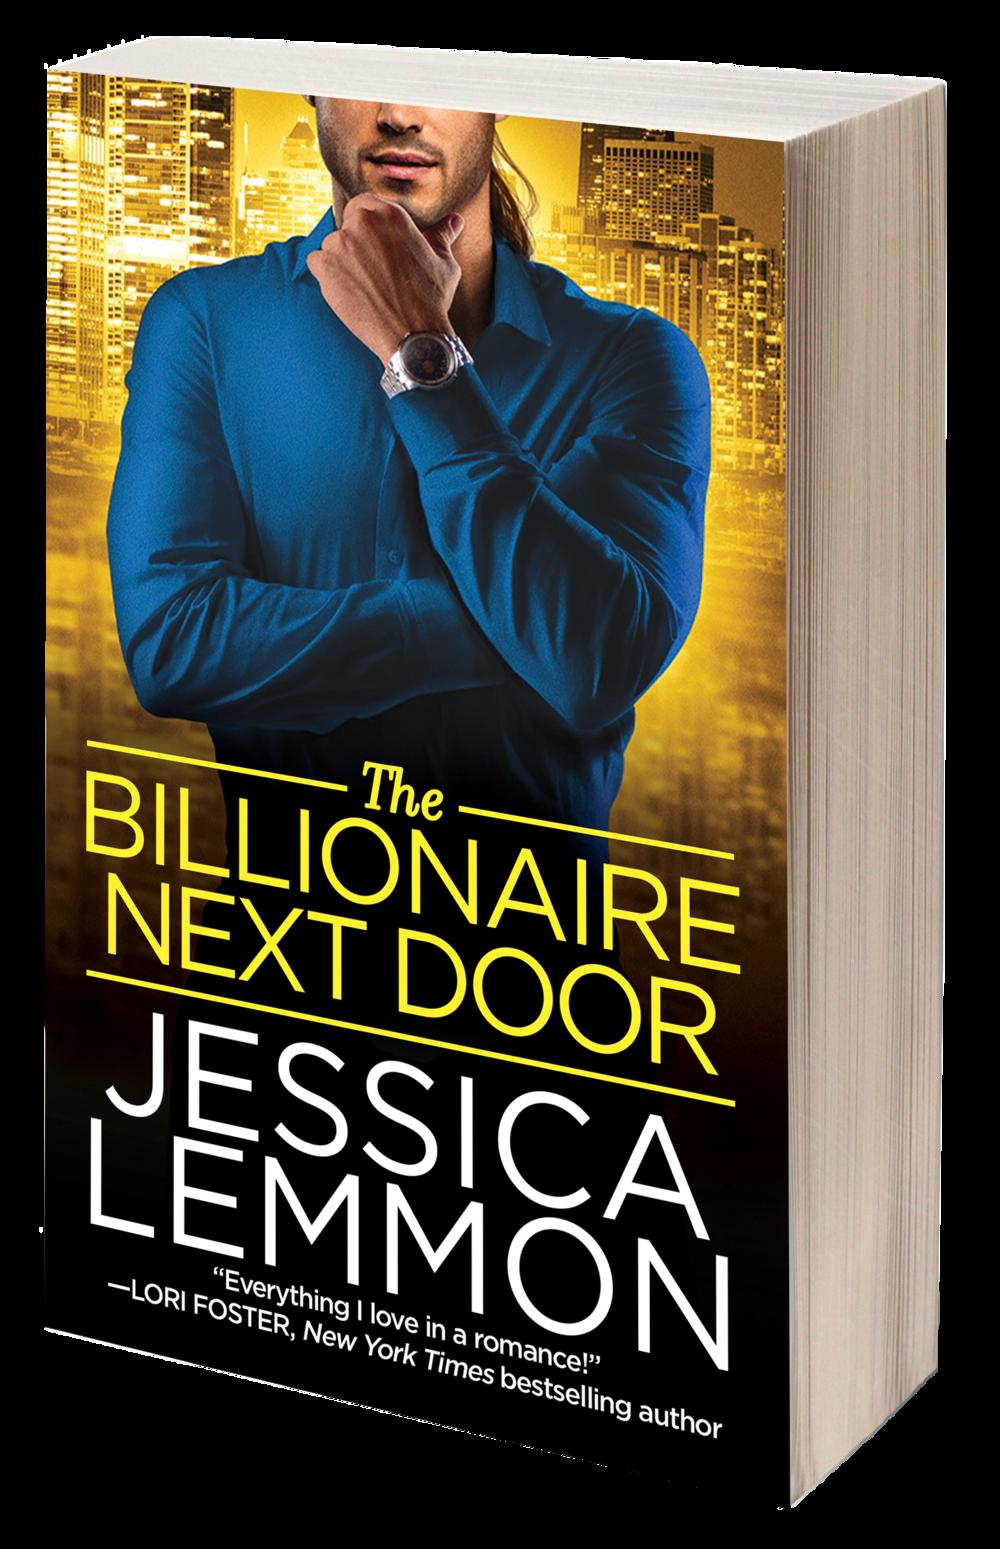 Billionaire-Next-Door-3D-Paperback-Cover-small.png